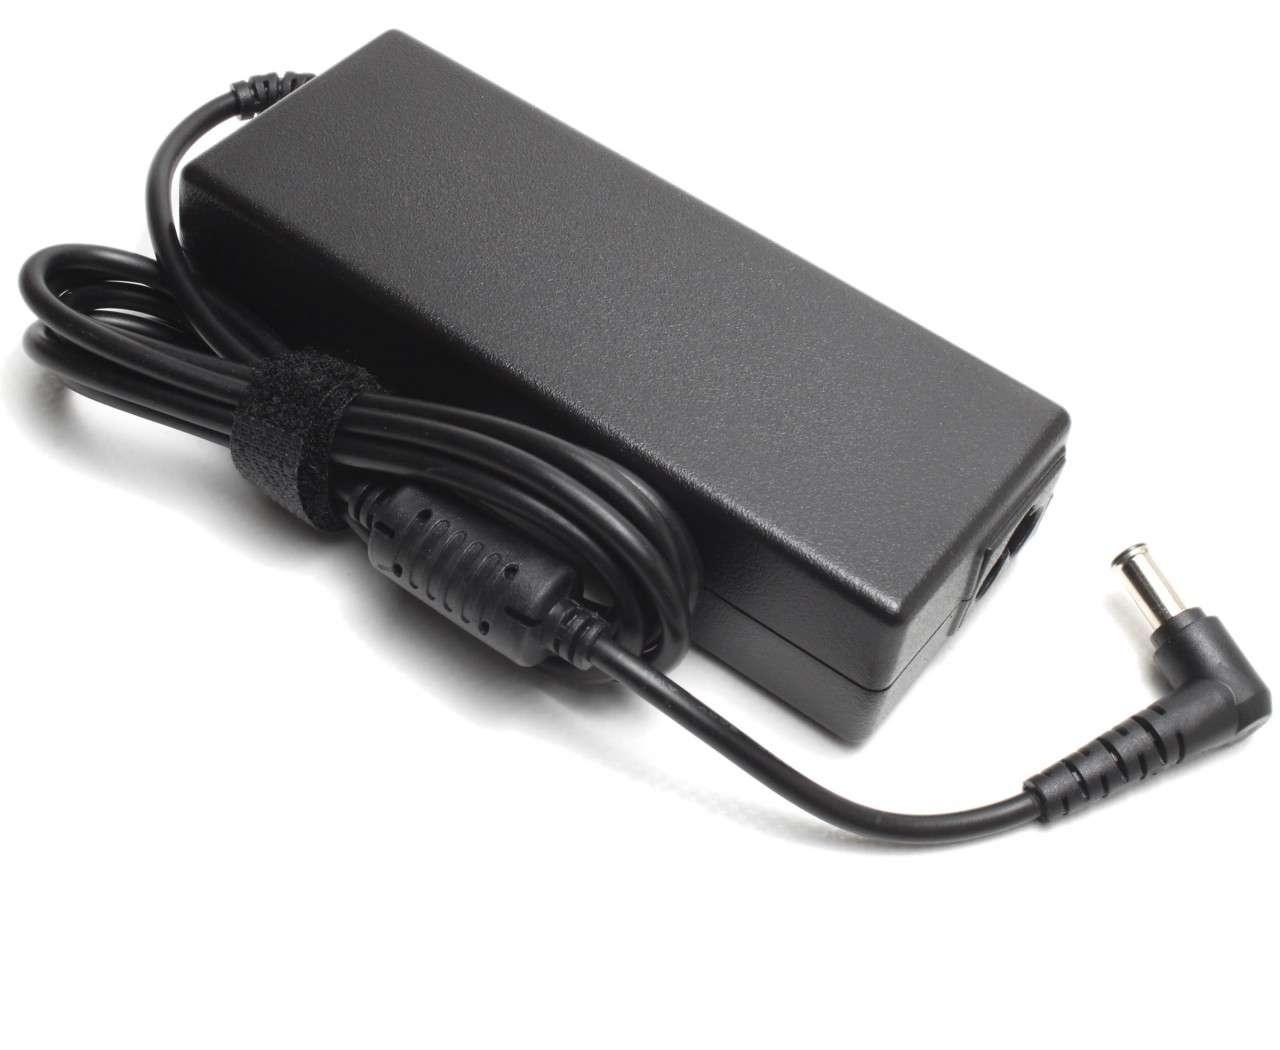 Incarcator Sony Vaio VGN FE48 Replacement imagine powerlaptop.ro 2021